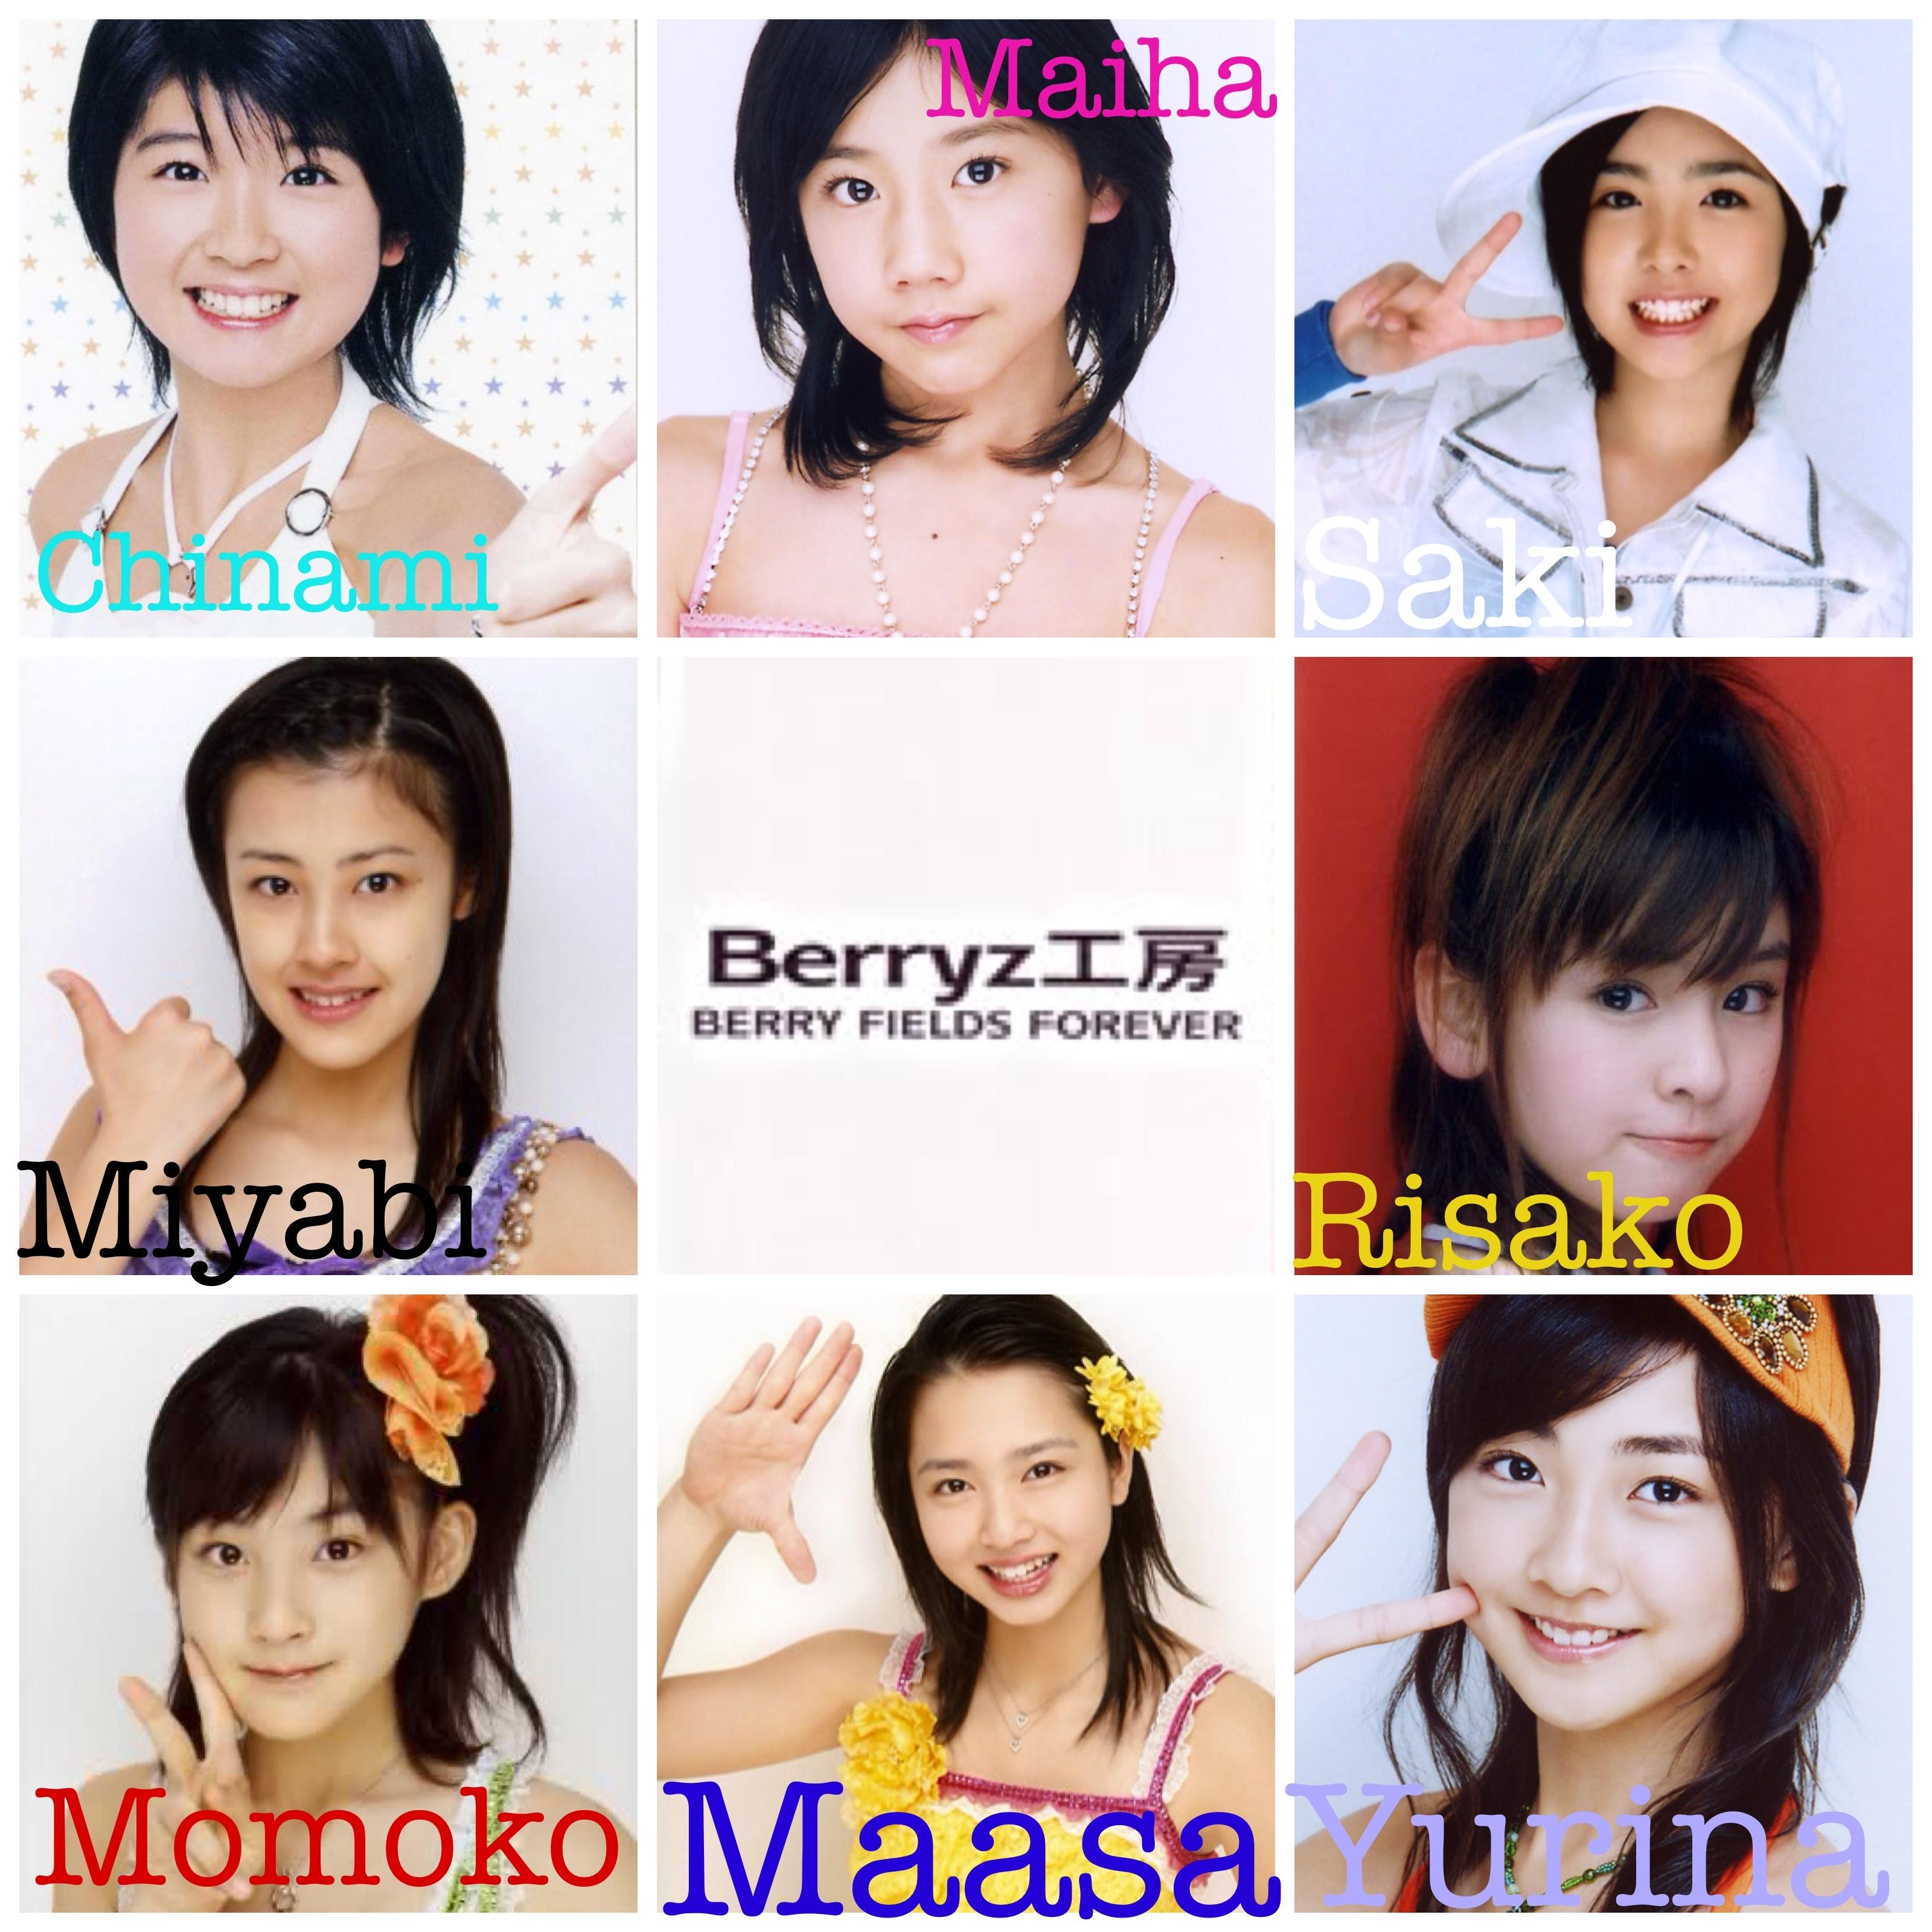 My Berryz Koubou picture collection 2.